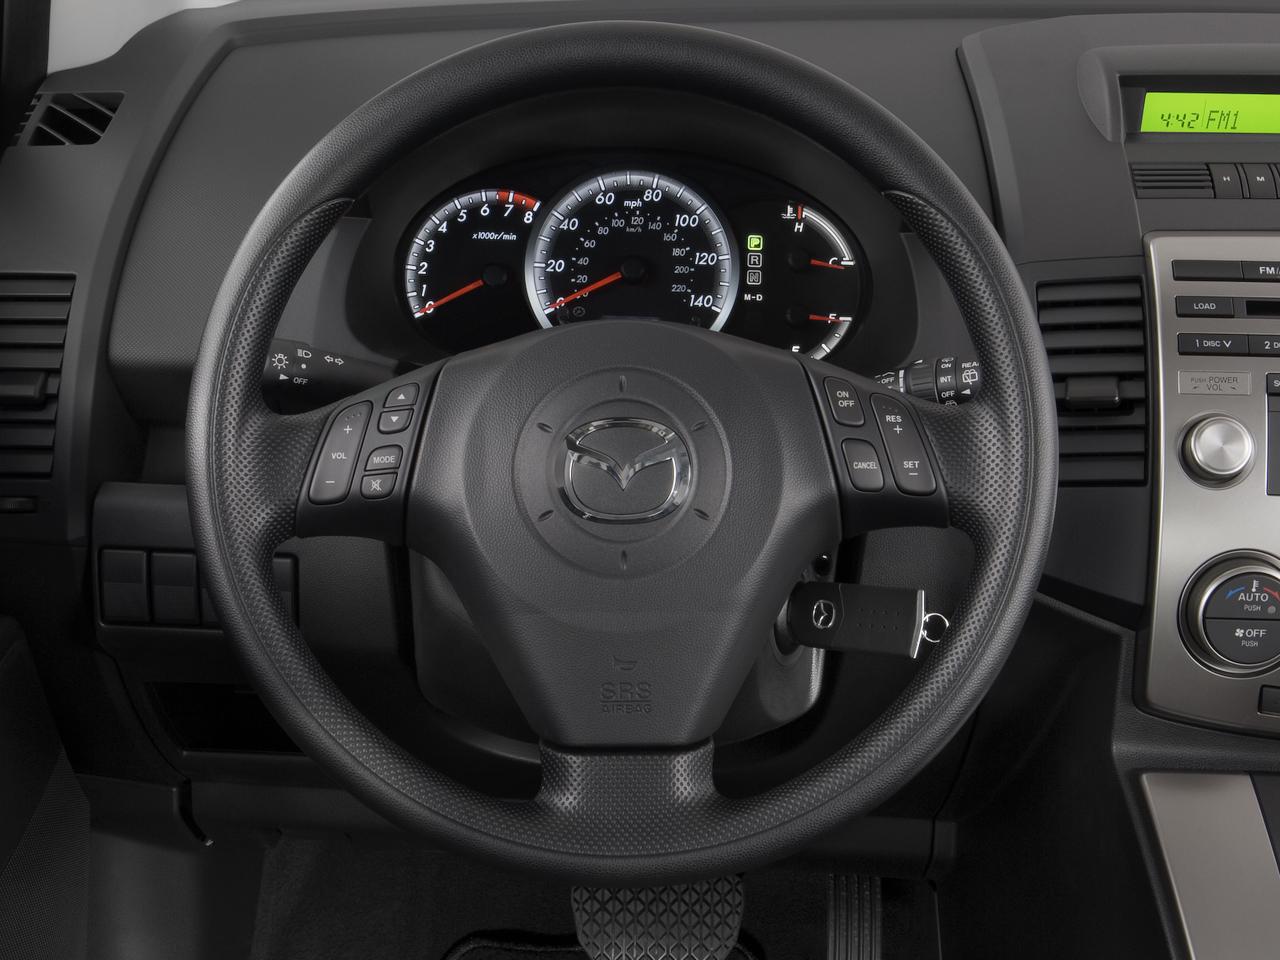 http://st.automobilemag.com/uploads/sites/10/2015/11/2008-mazda-mazda5-sport-wagon-steering-wheel.png